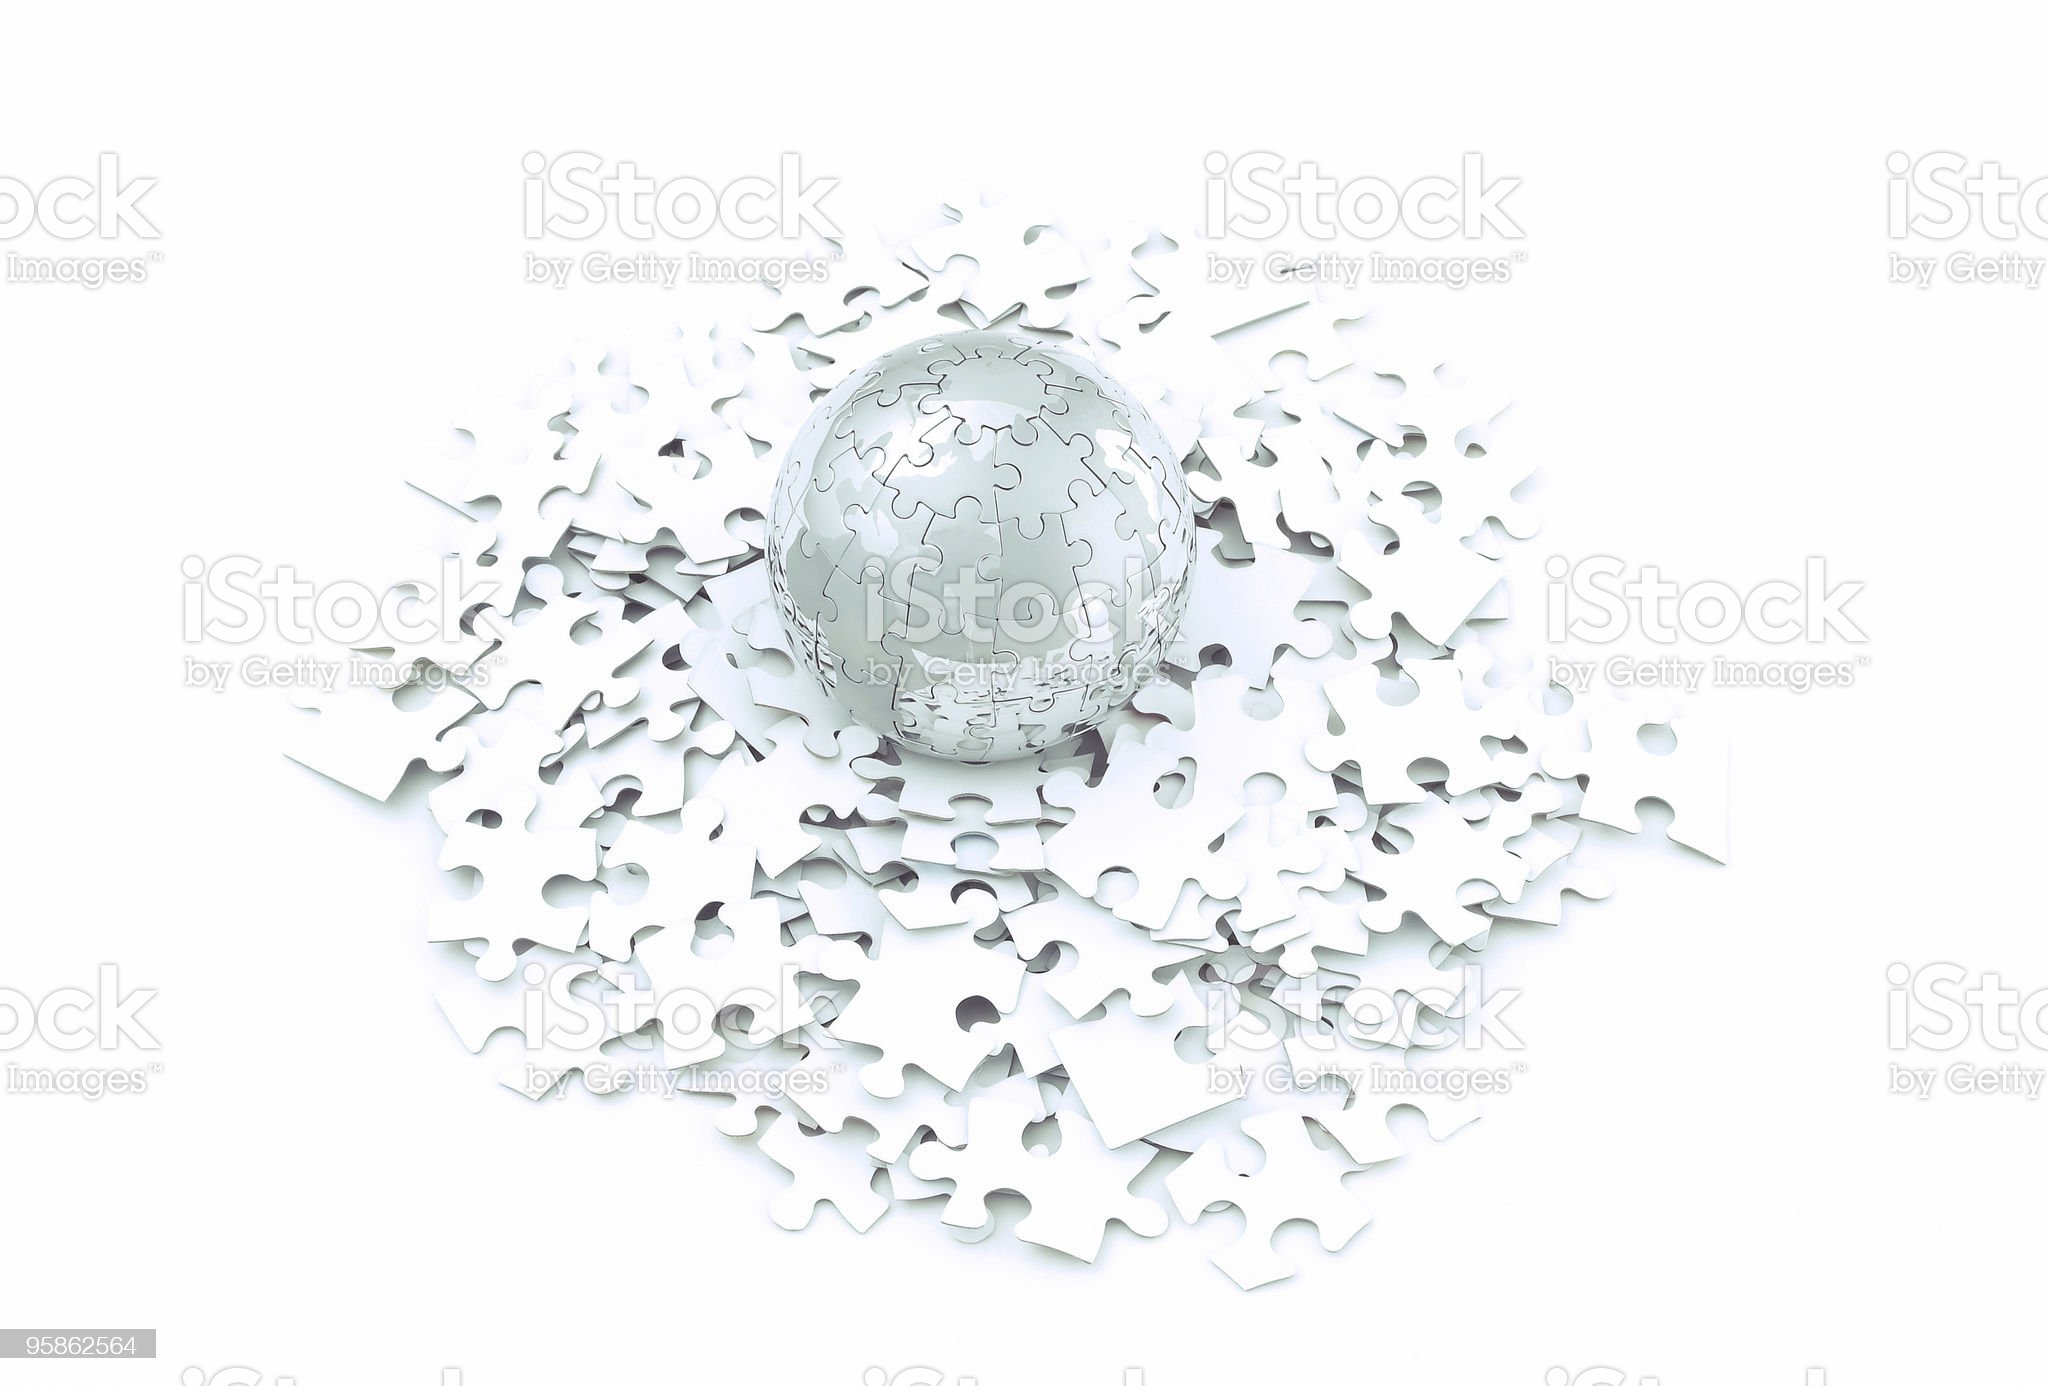 Jigsaw puzzle of globe royalty-free stock photo